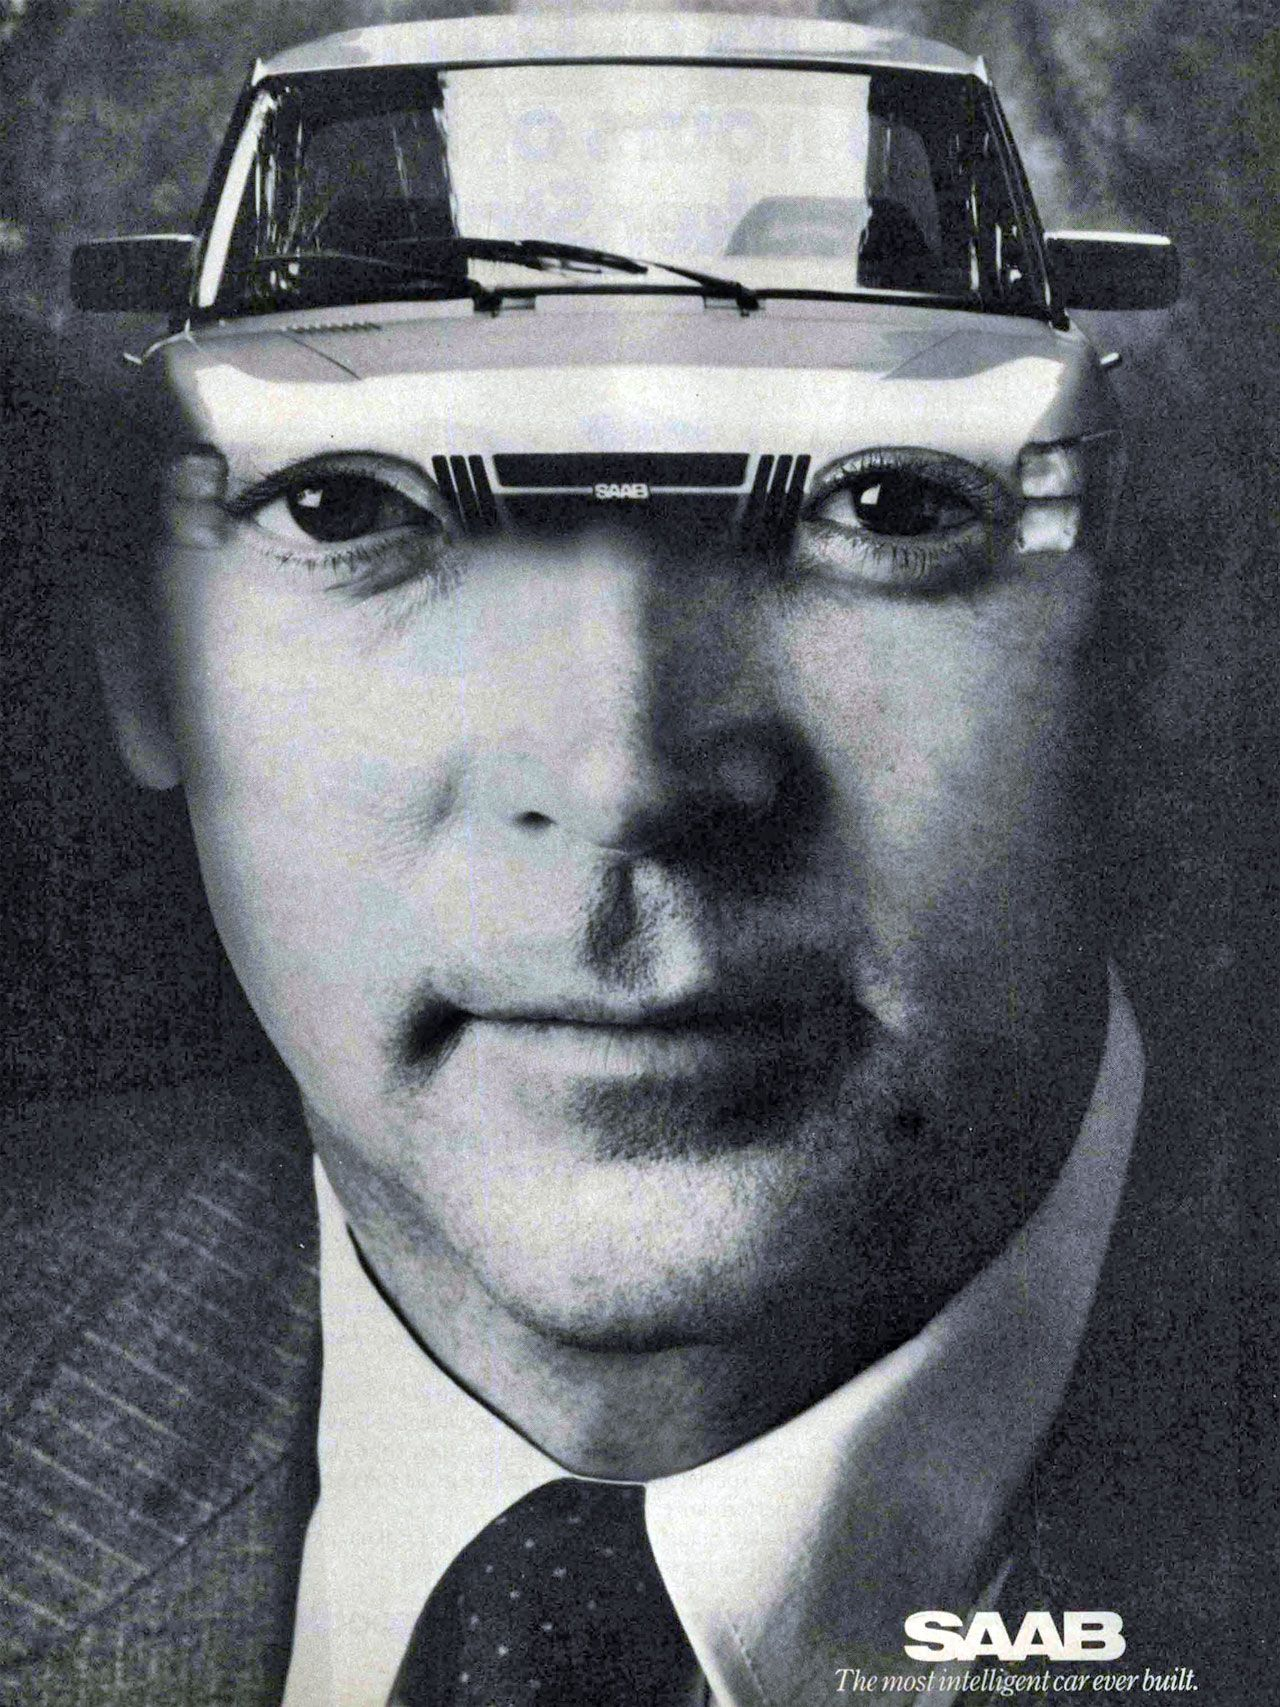 SAAB. The most intelligent car ever built.